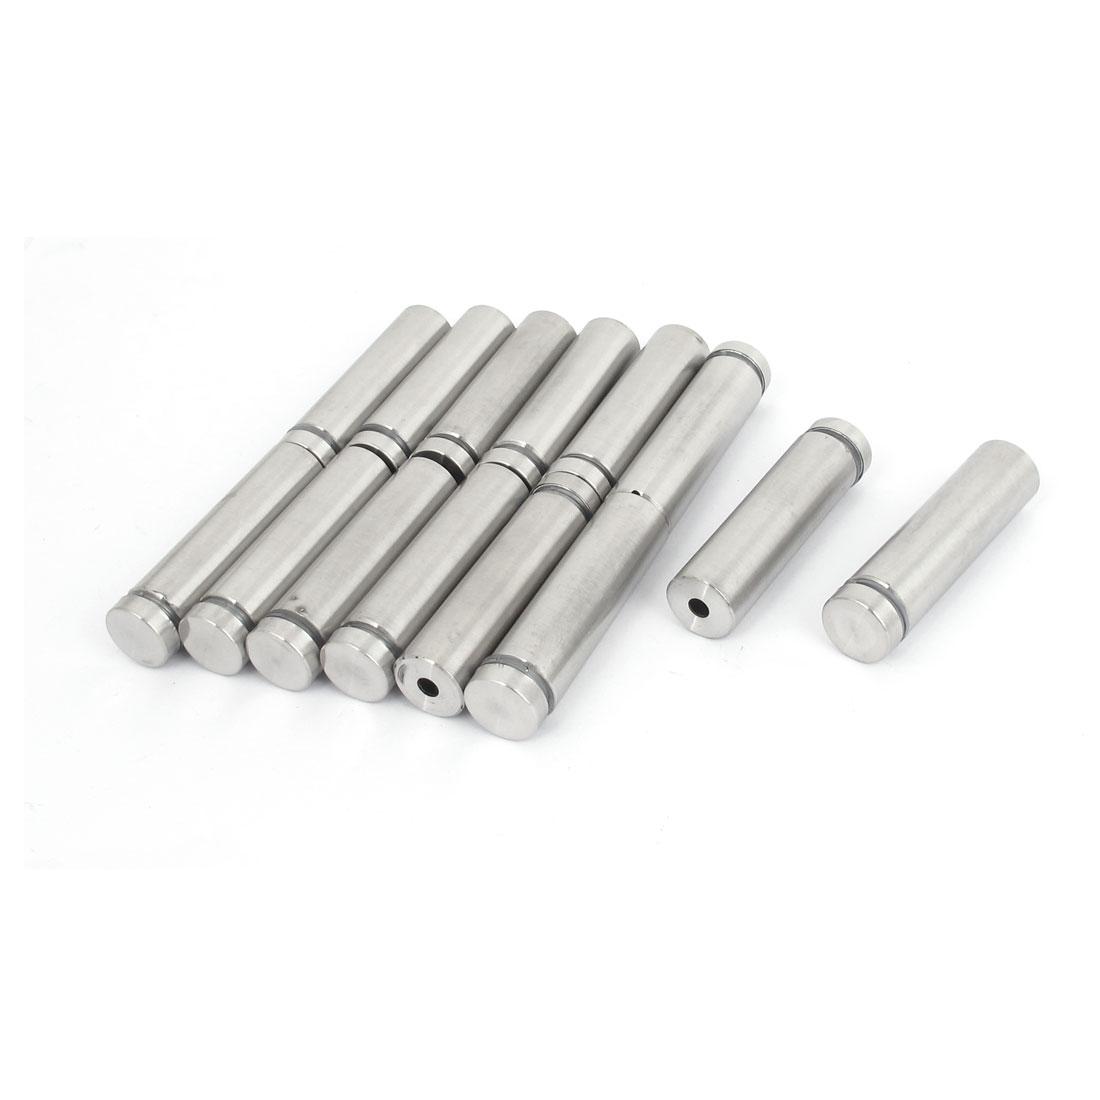 16mm x 60mm Stainless Steel Advertising Frameless Glass Standoff Pins 14pcs